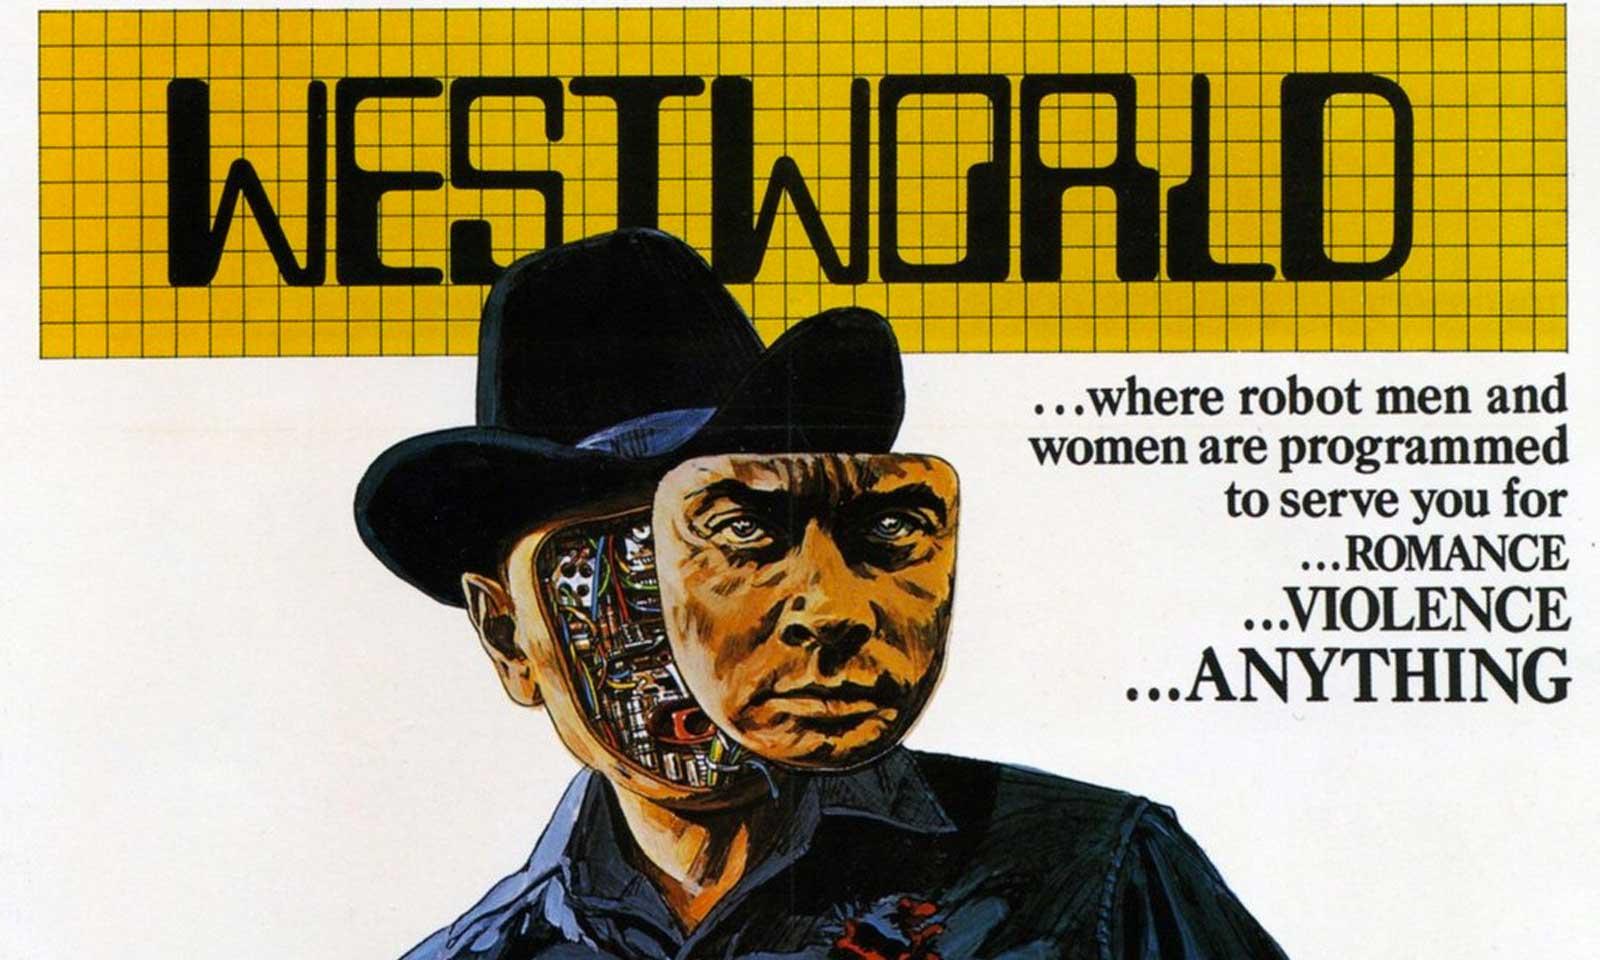 Westworld feature imaged